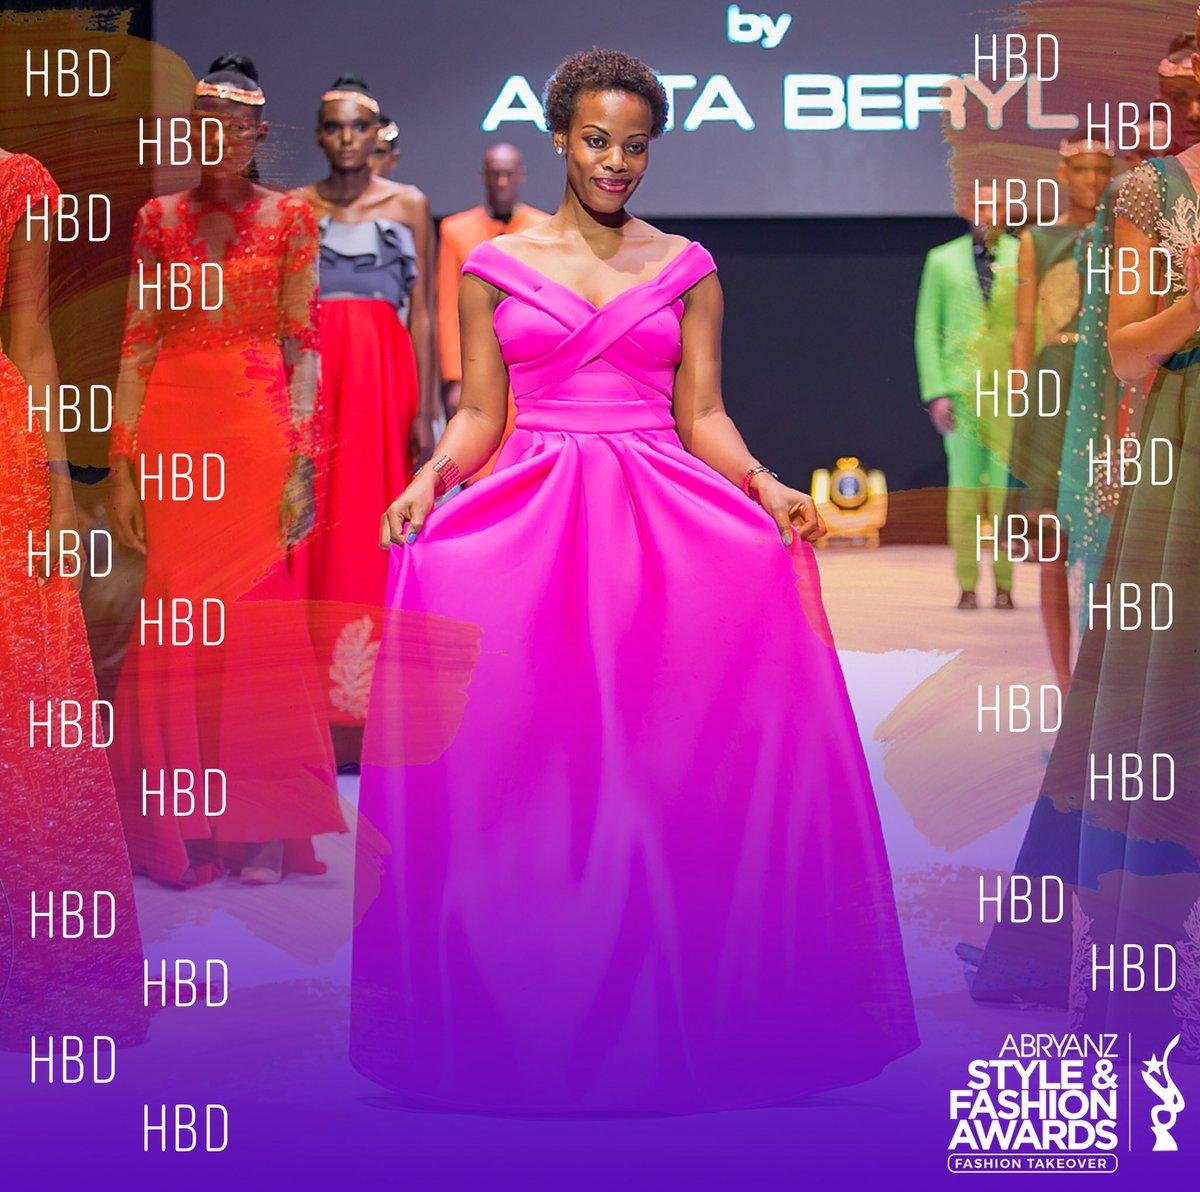 Asfa2020 On Twitter Happy Birthday To Ugandan Celebrated Fashion Designer Asfa2016 Winner Anitaberyl Nibstudios